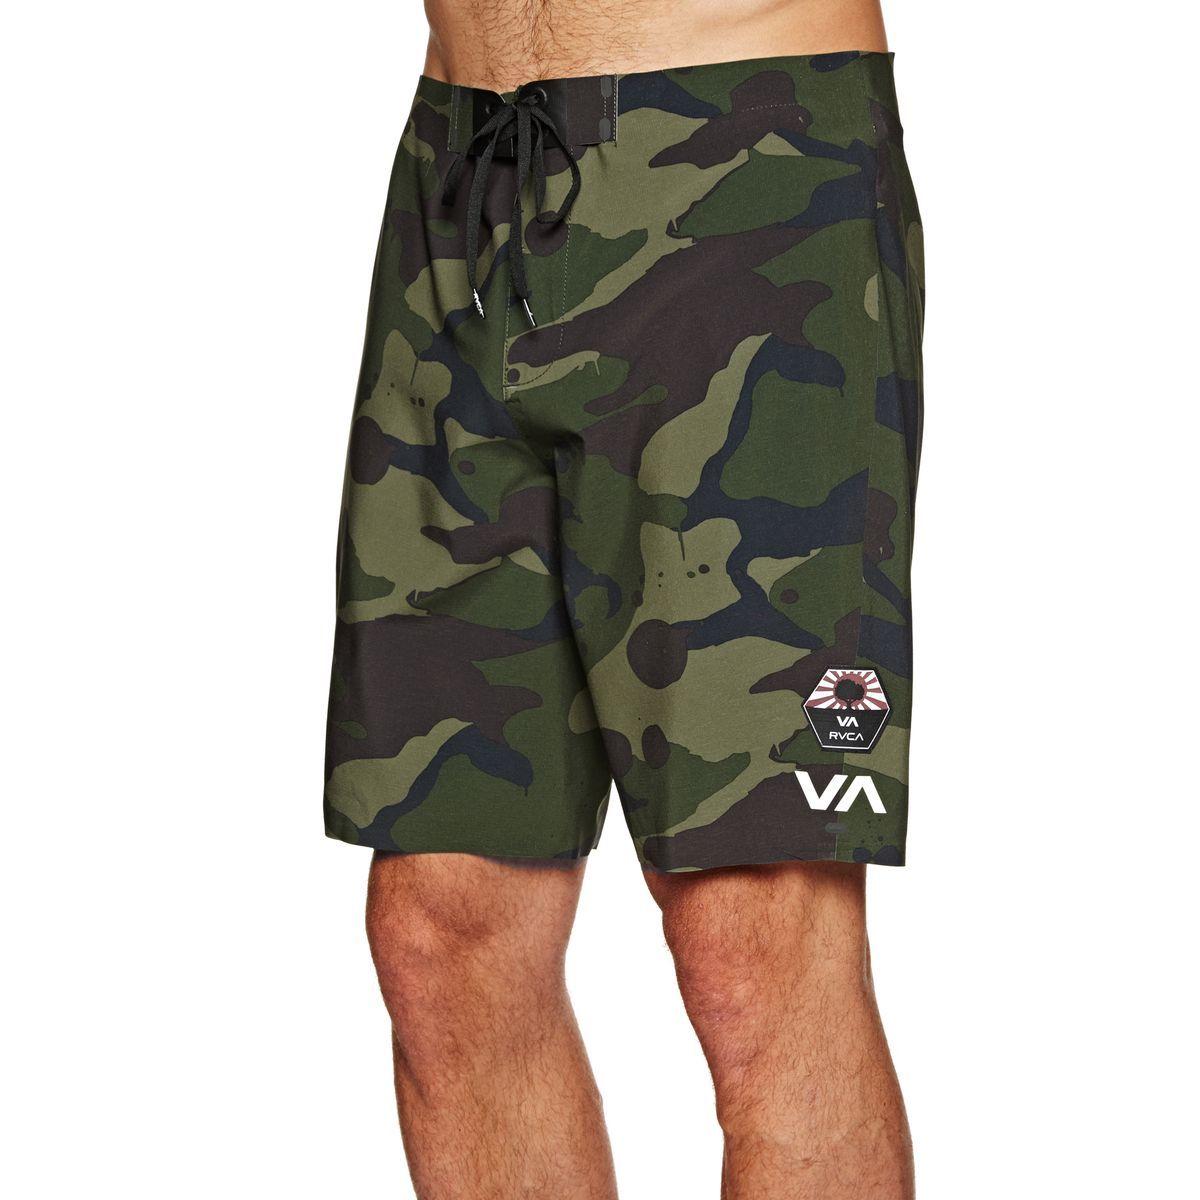 Buy RVCA Bruce Warp Pro Trunk Board Shorts Camo with great